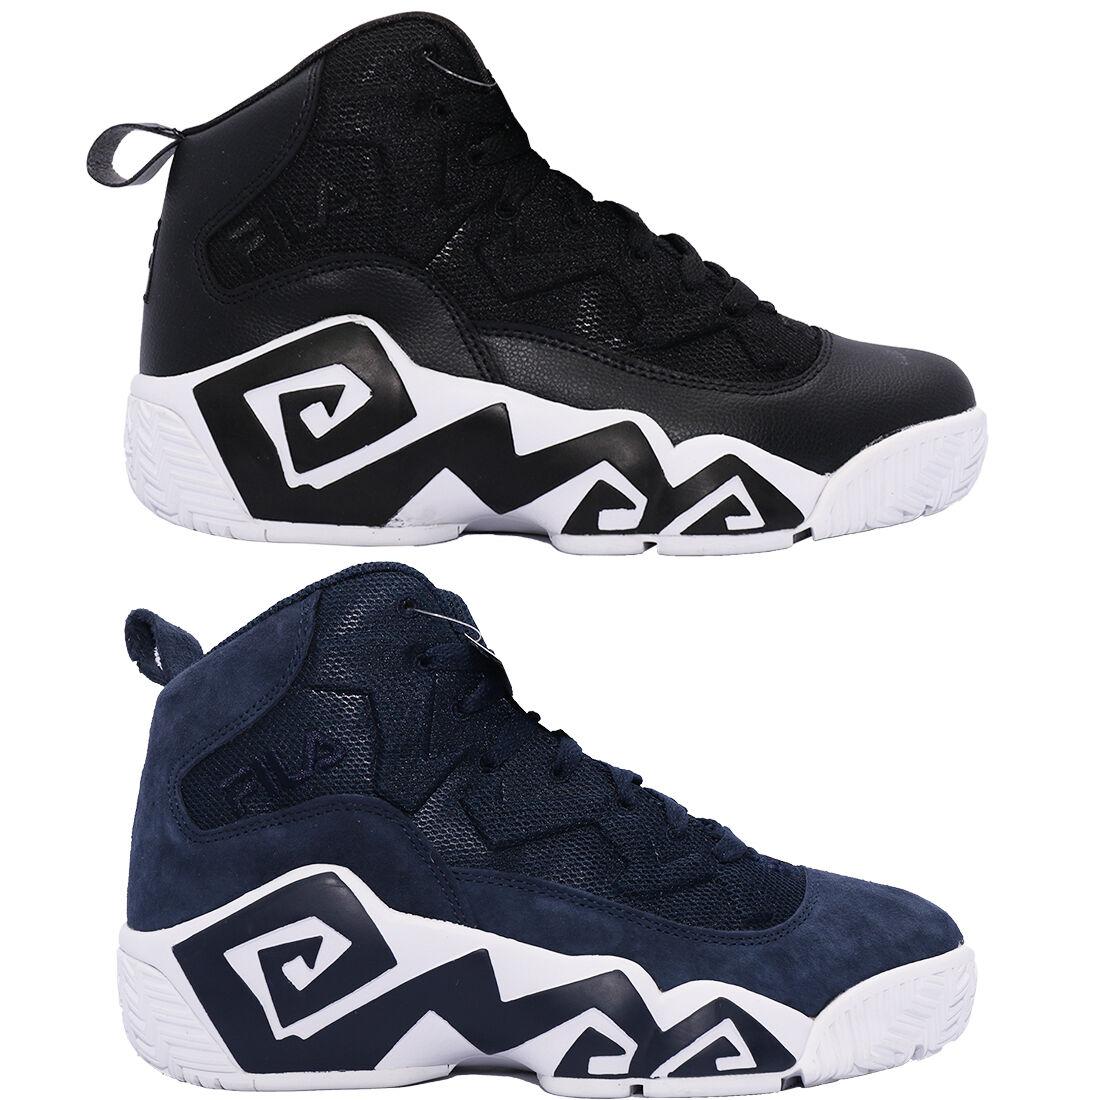 New Hombre malla fila edicion limitada 1vb90178 malla Hombre Basketball zapatillas retro MB f1b411